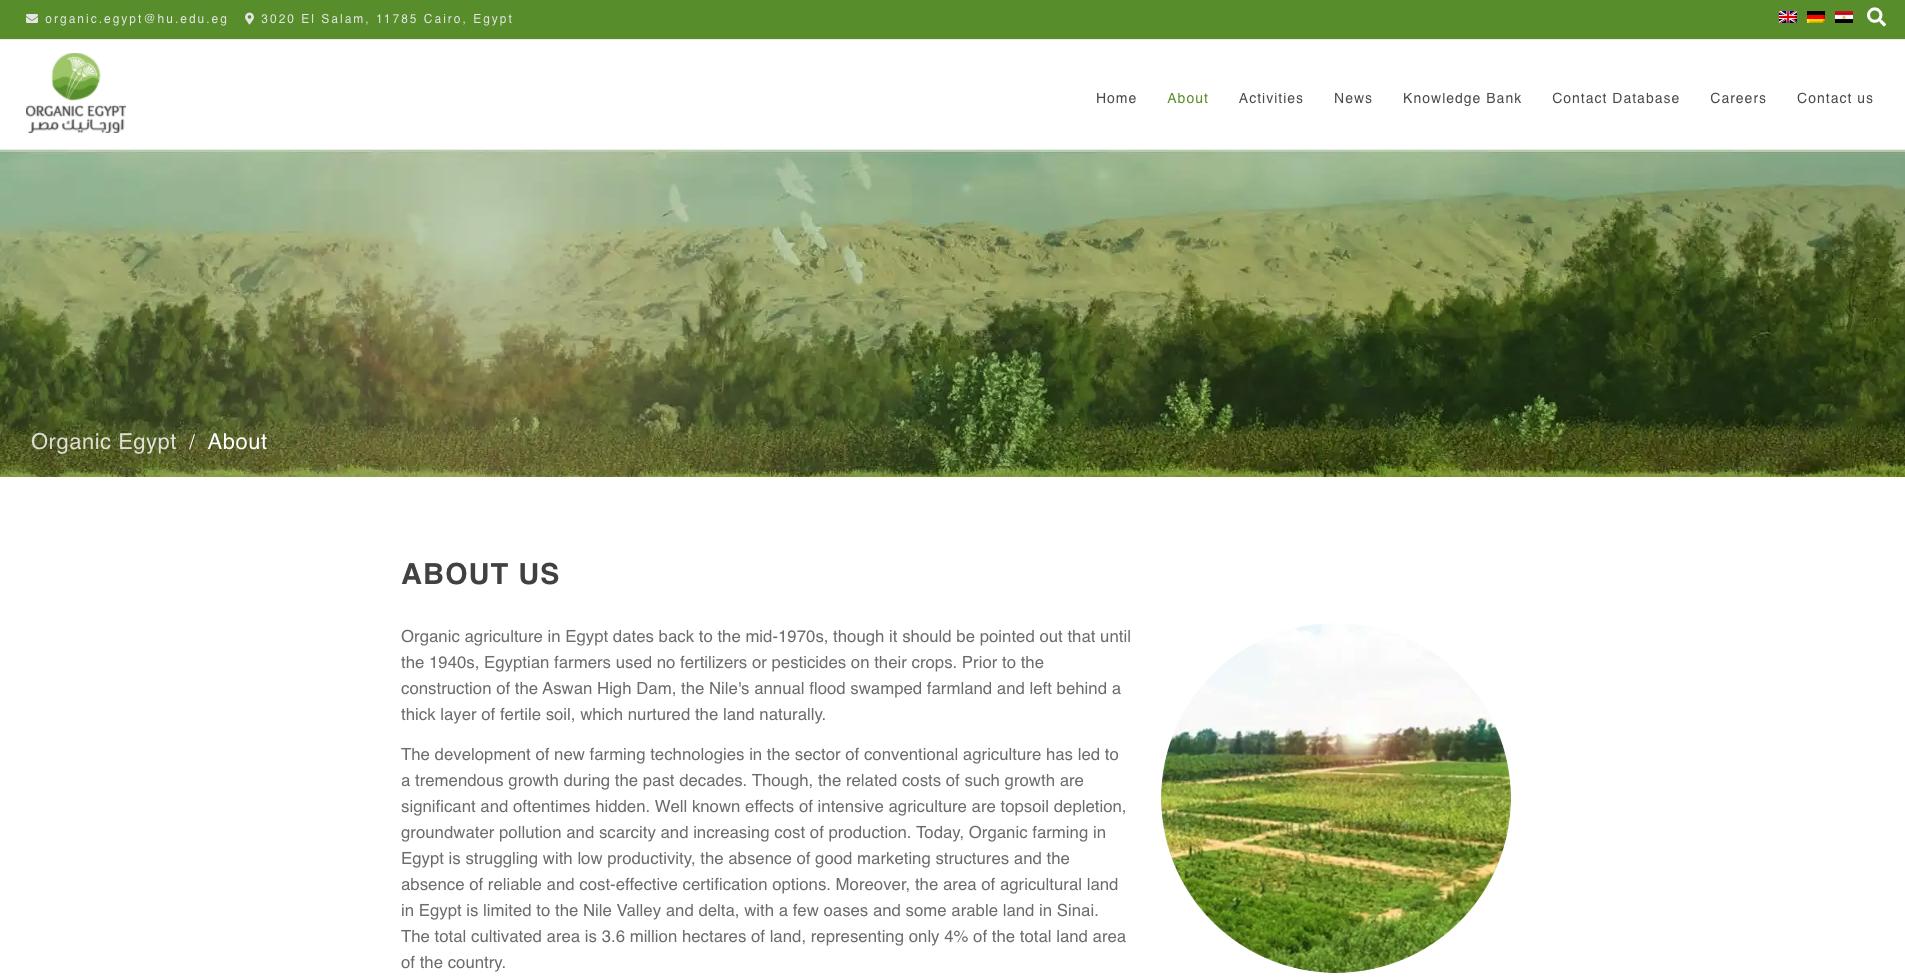 Organic Egypt Website